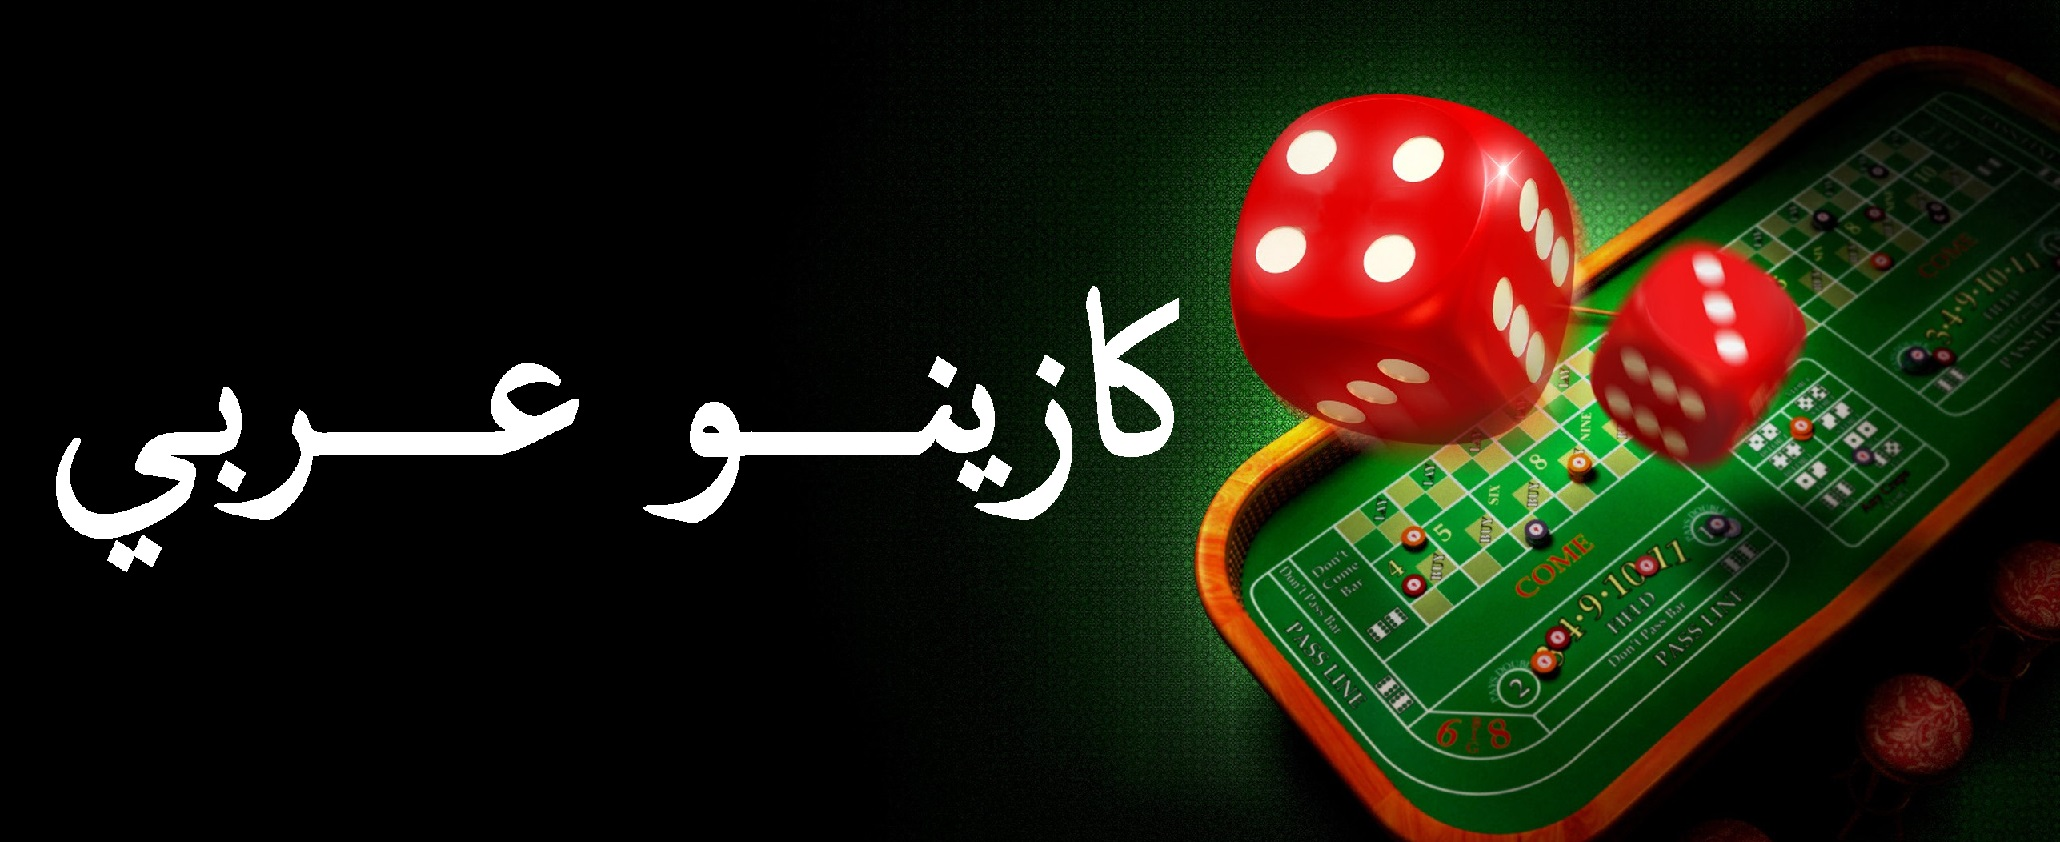 كازينوهات مصر موقع - 81740